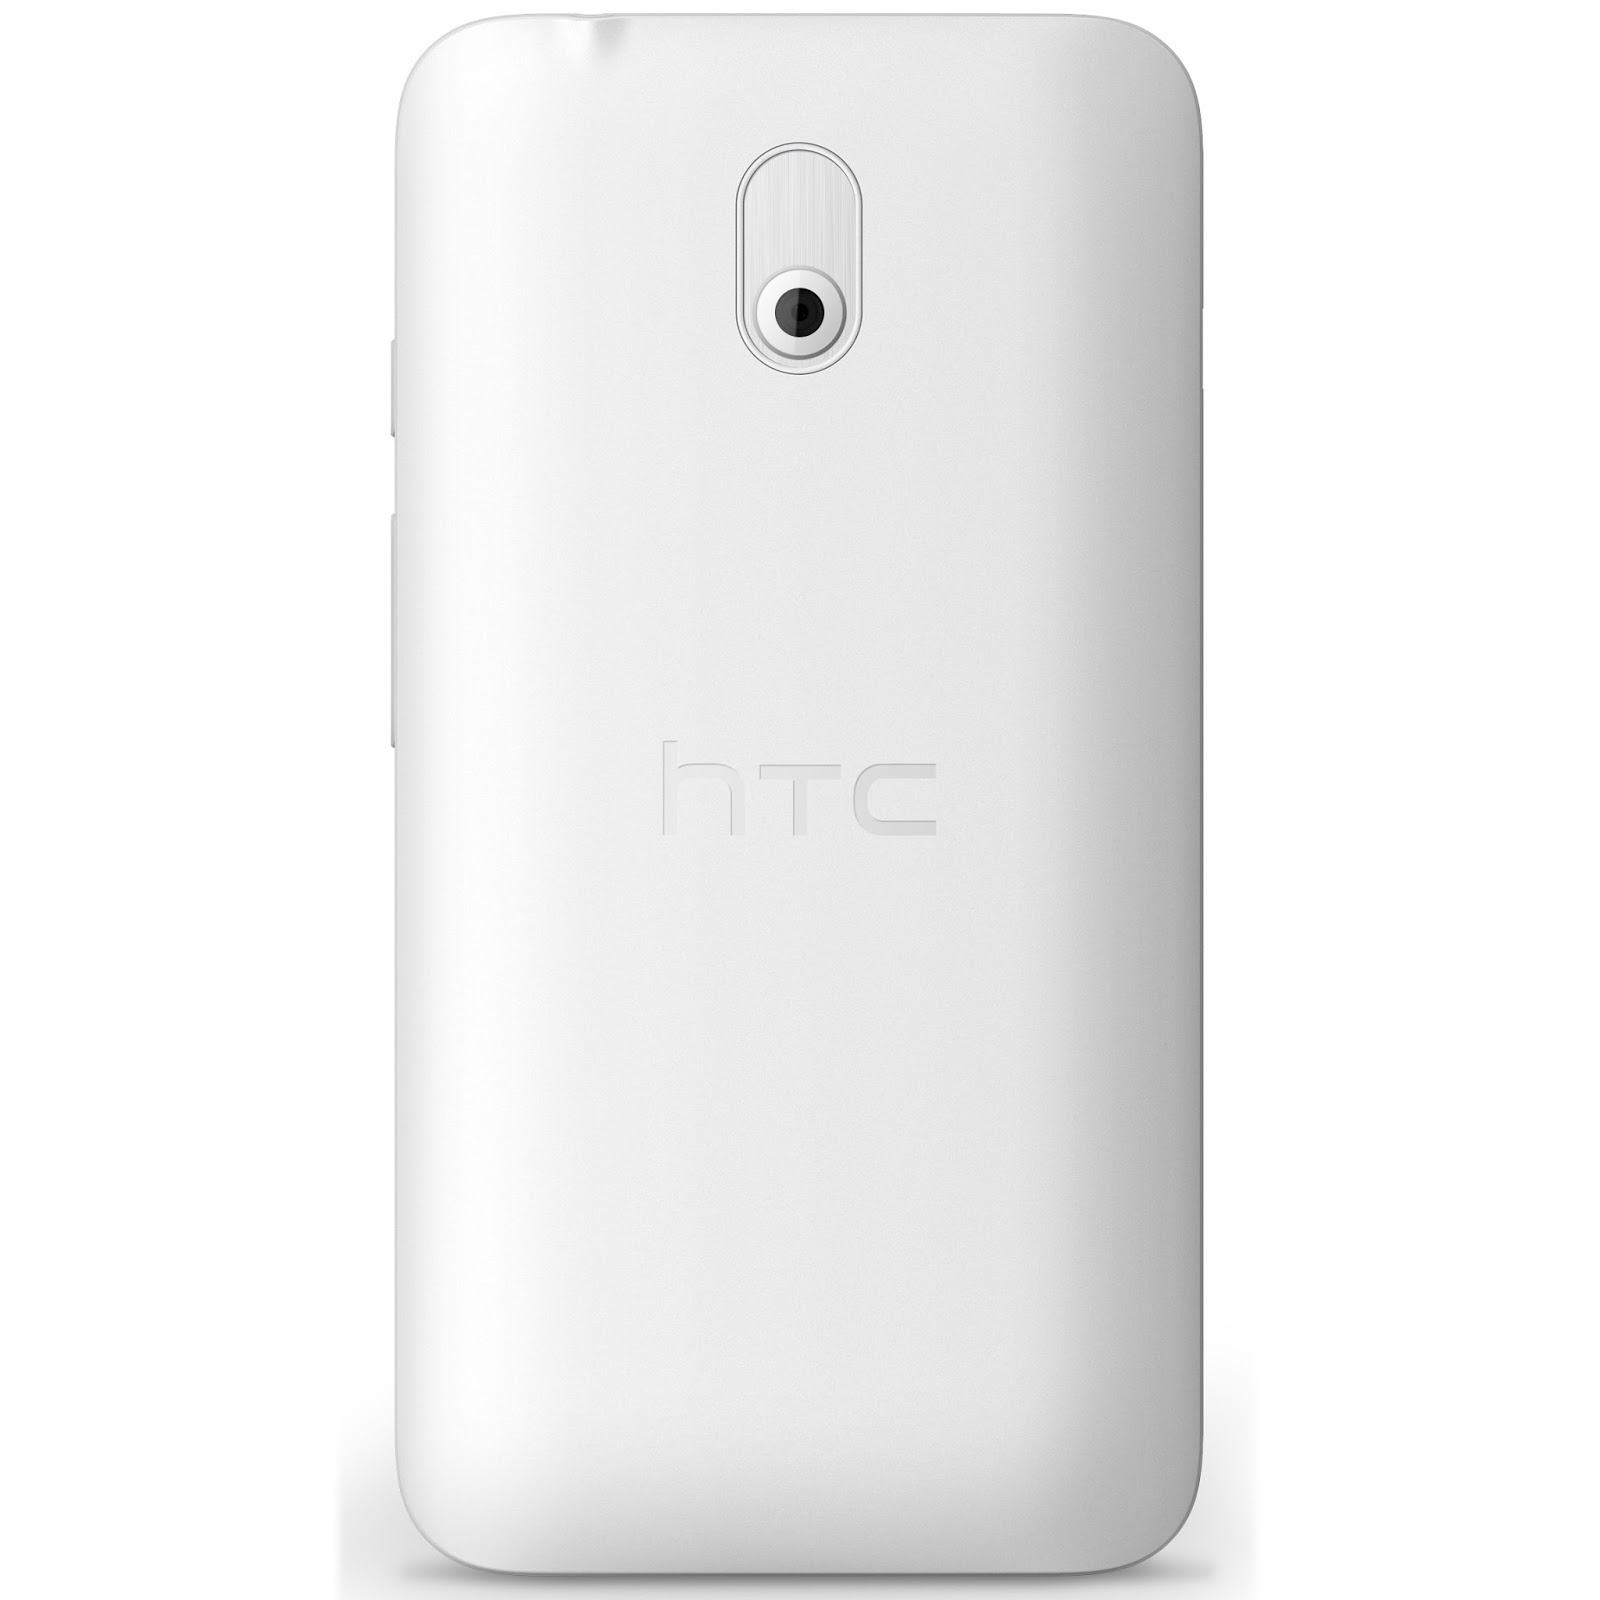 Daftar Harga Htc One E8 Smartphone Dark Grey 16gb 2gb Dual Sim Casio G Shock Ga 500k 3ajr Limited Models Resin Band Djs Mobiles Technology Blog Specs Android Phones